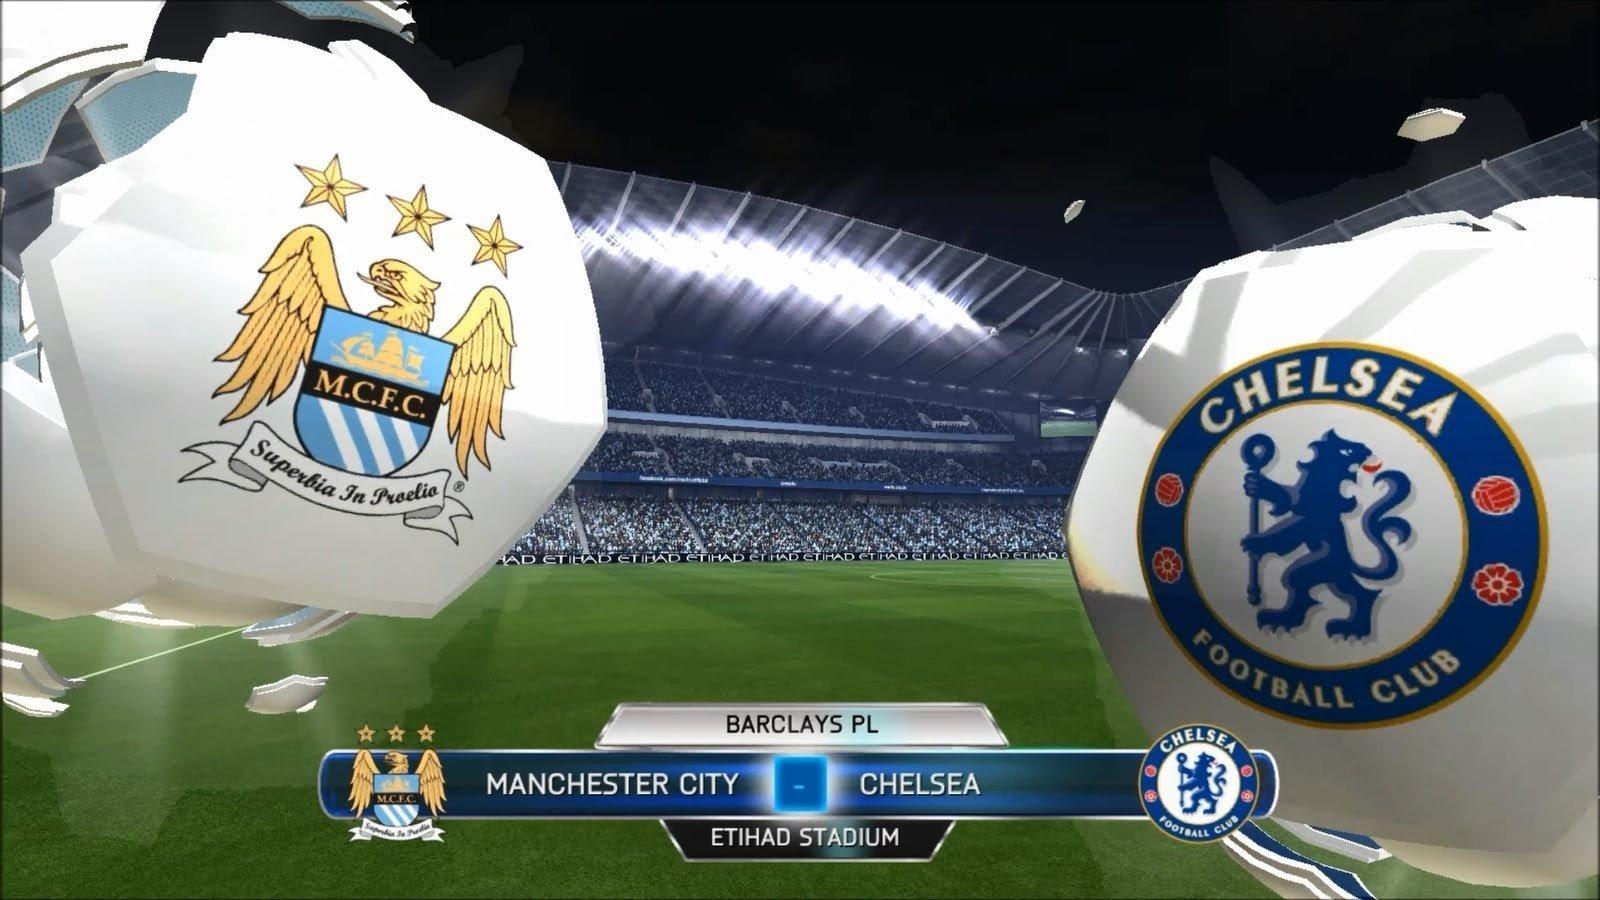 Прогноз на матч Манчестер Сити - Челси 03 декабря 2016